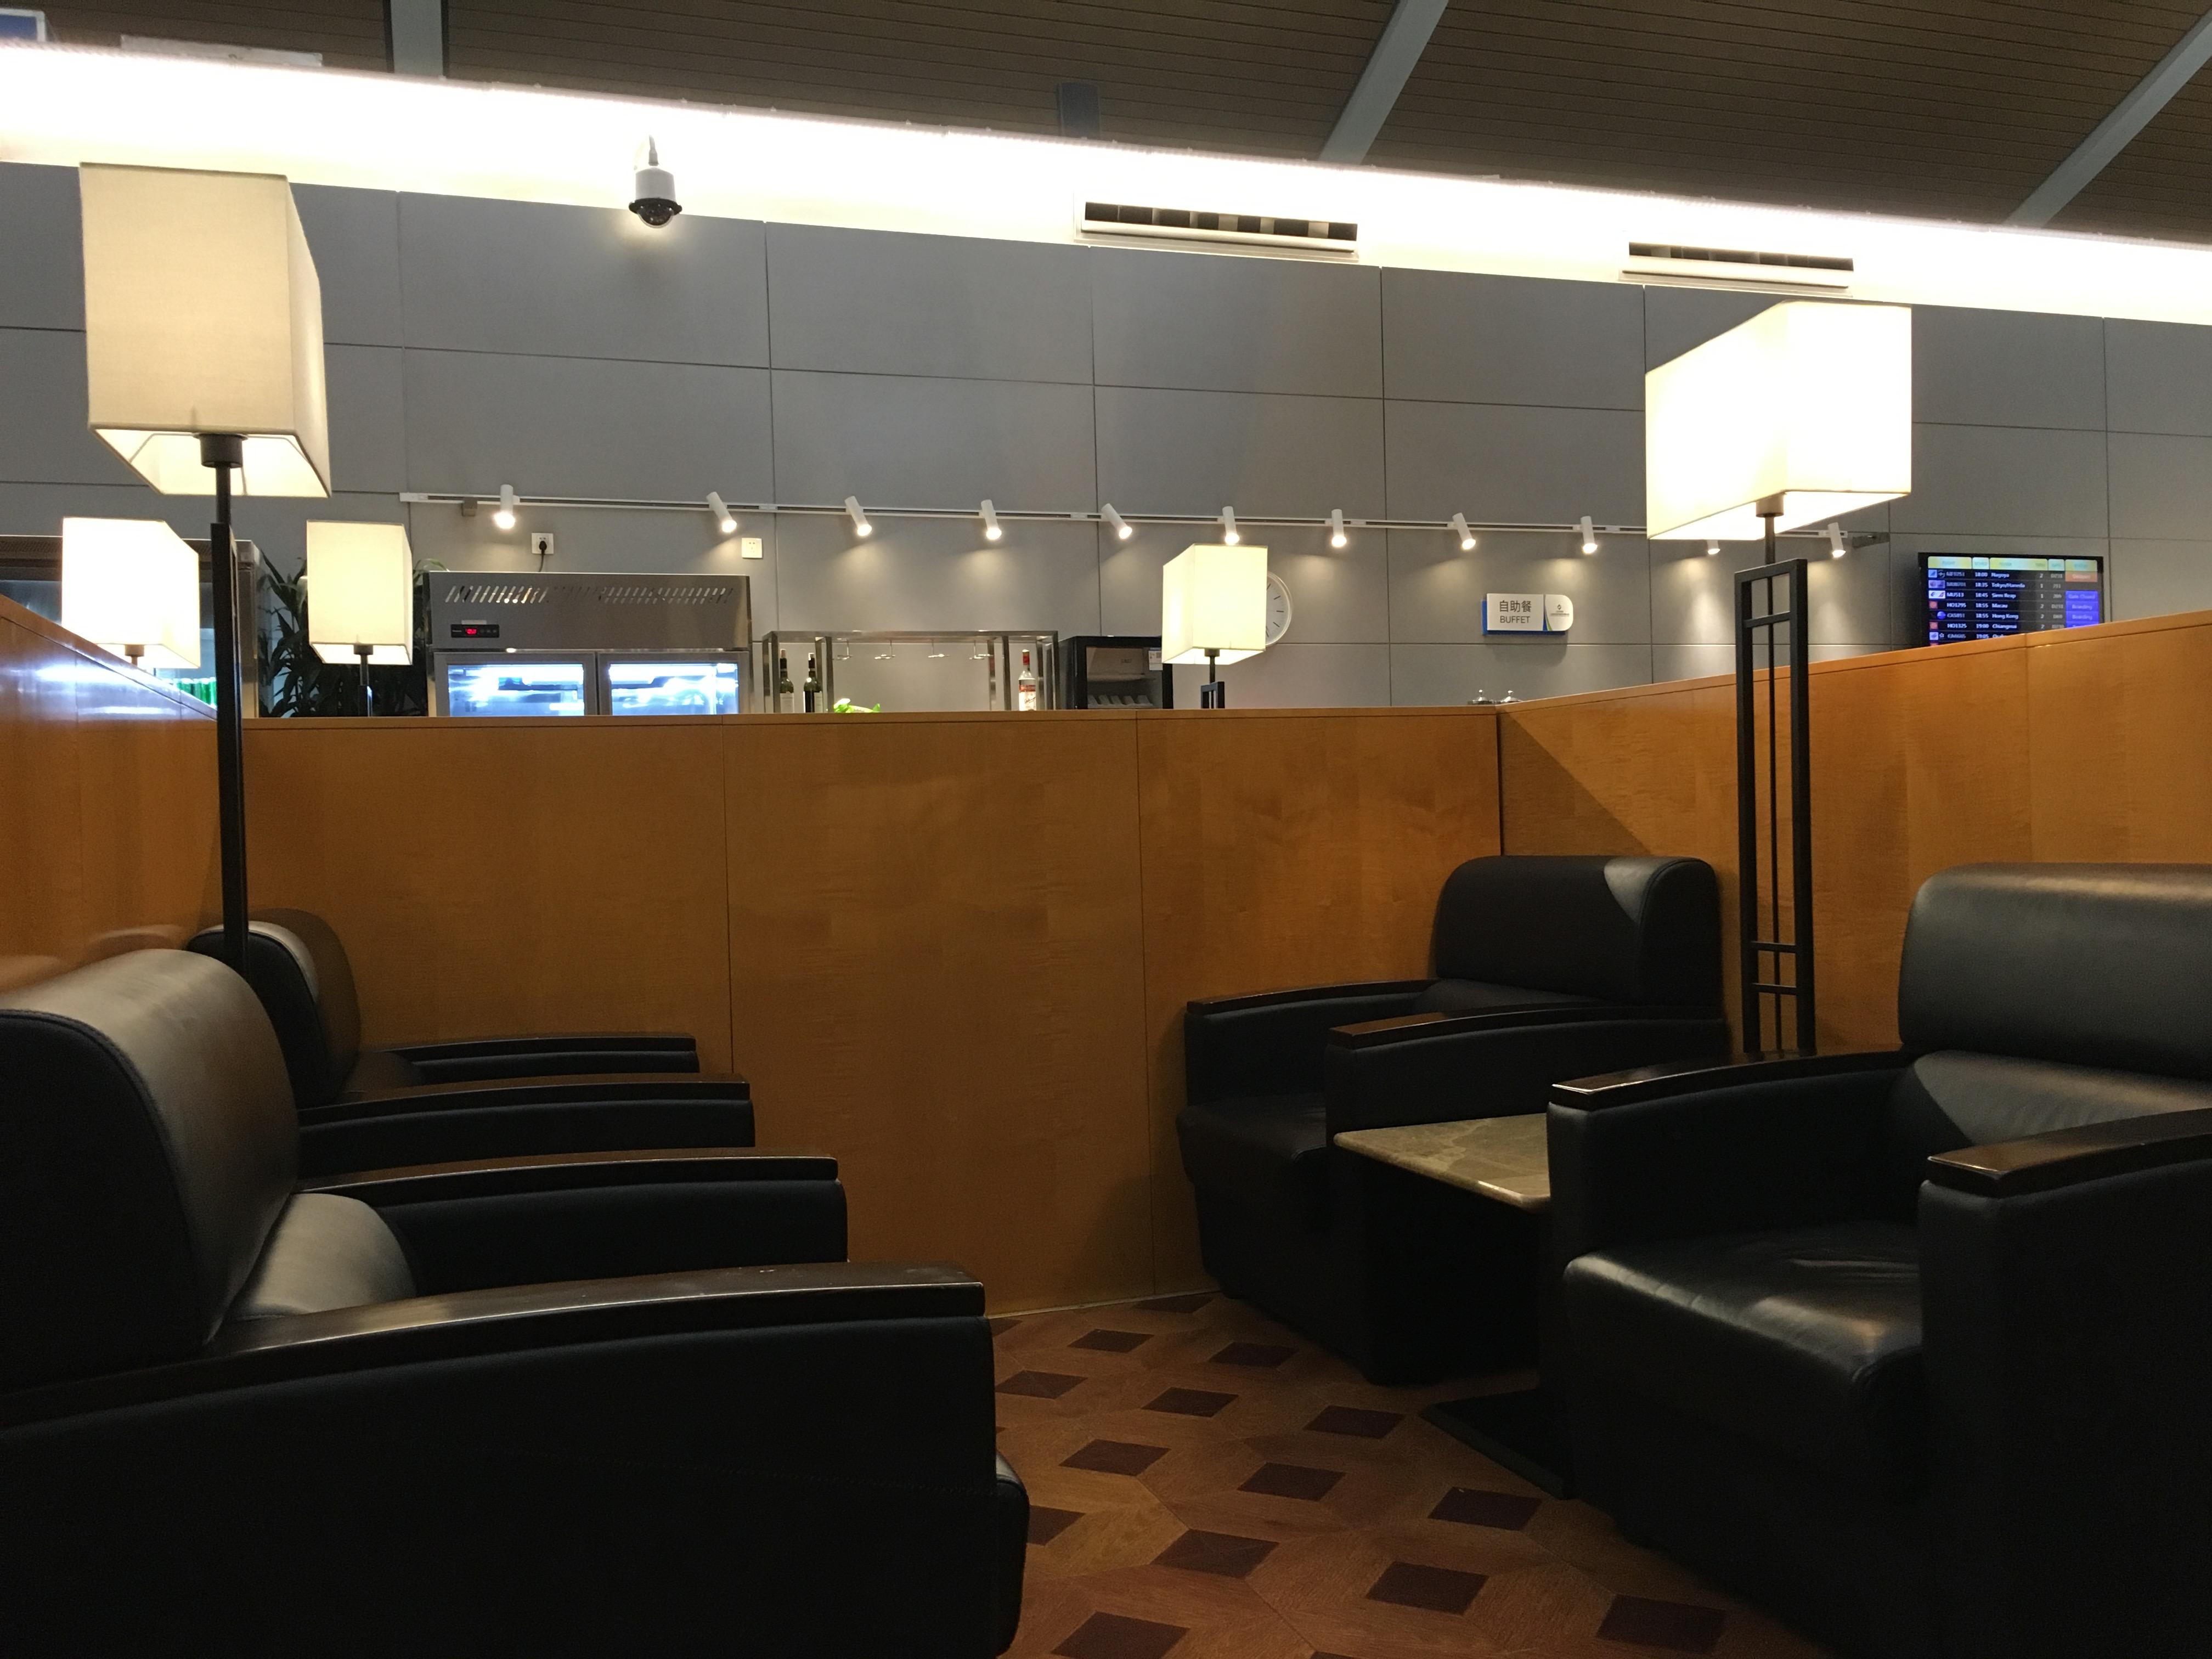 Lounge Review : 上海浦東空港(PVG) No. 69 Lounge